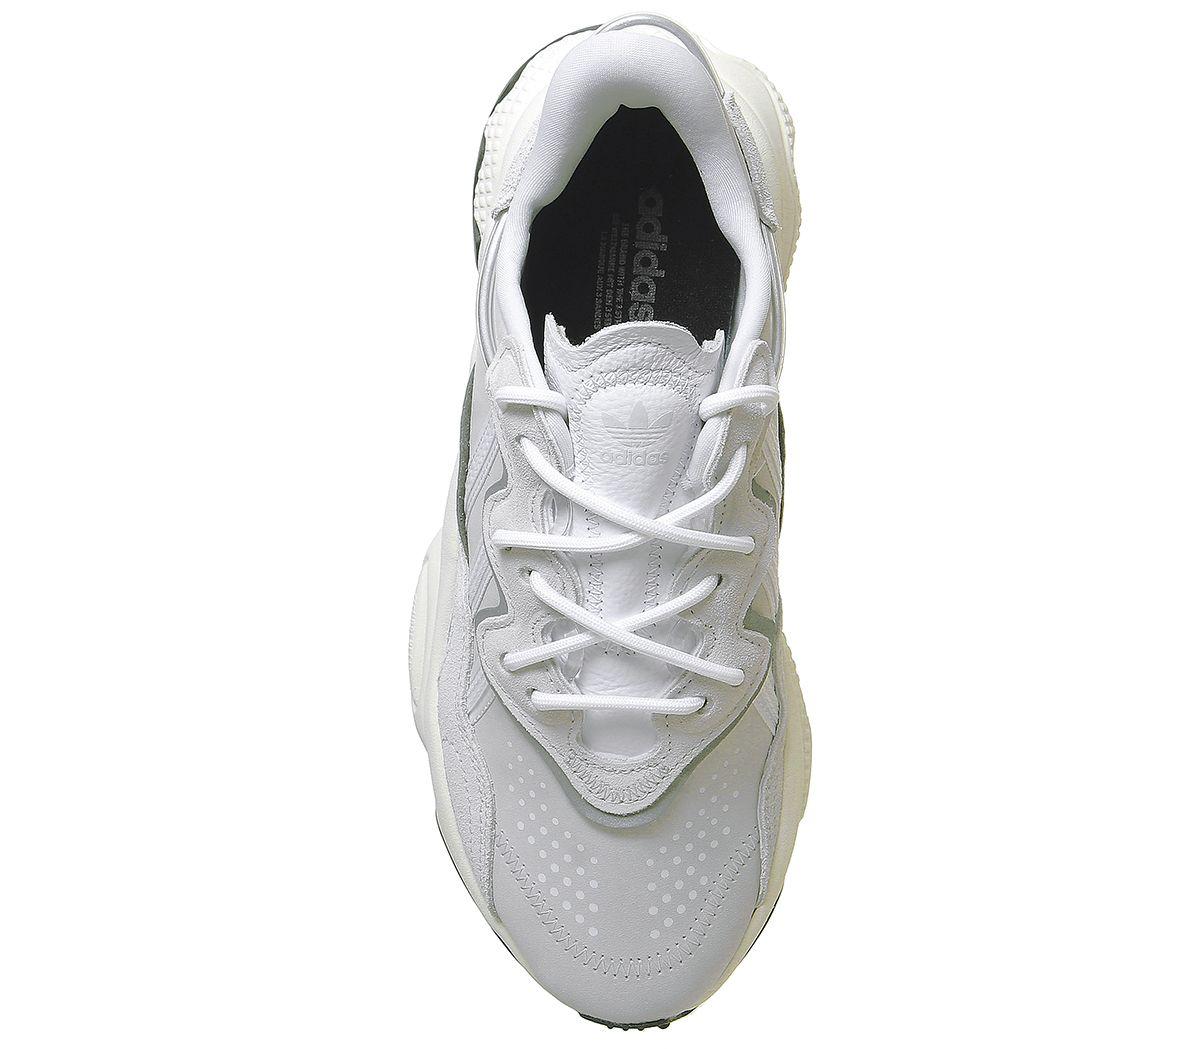 Adidas-ozweego-Baskets-Blanc-Cristal-Blanc-casse-Baskets-Chaussures miniature 5